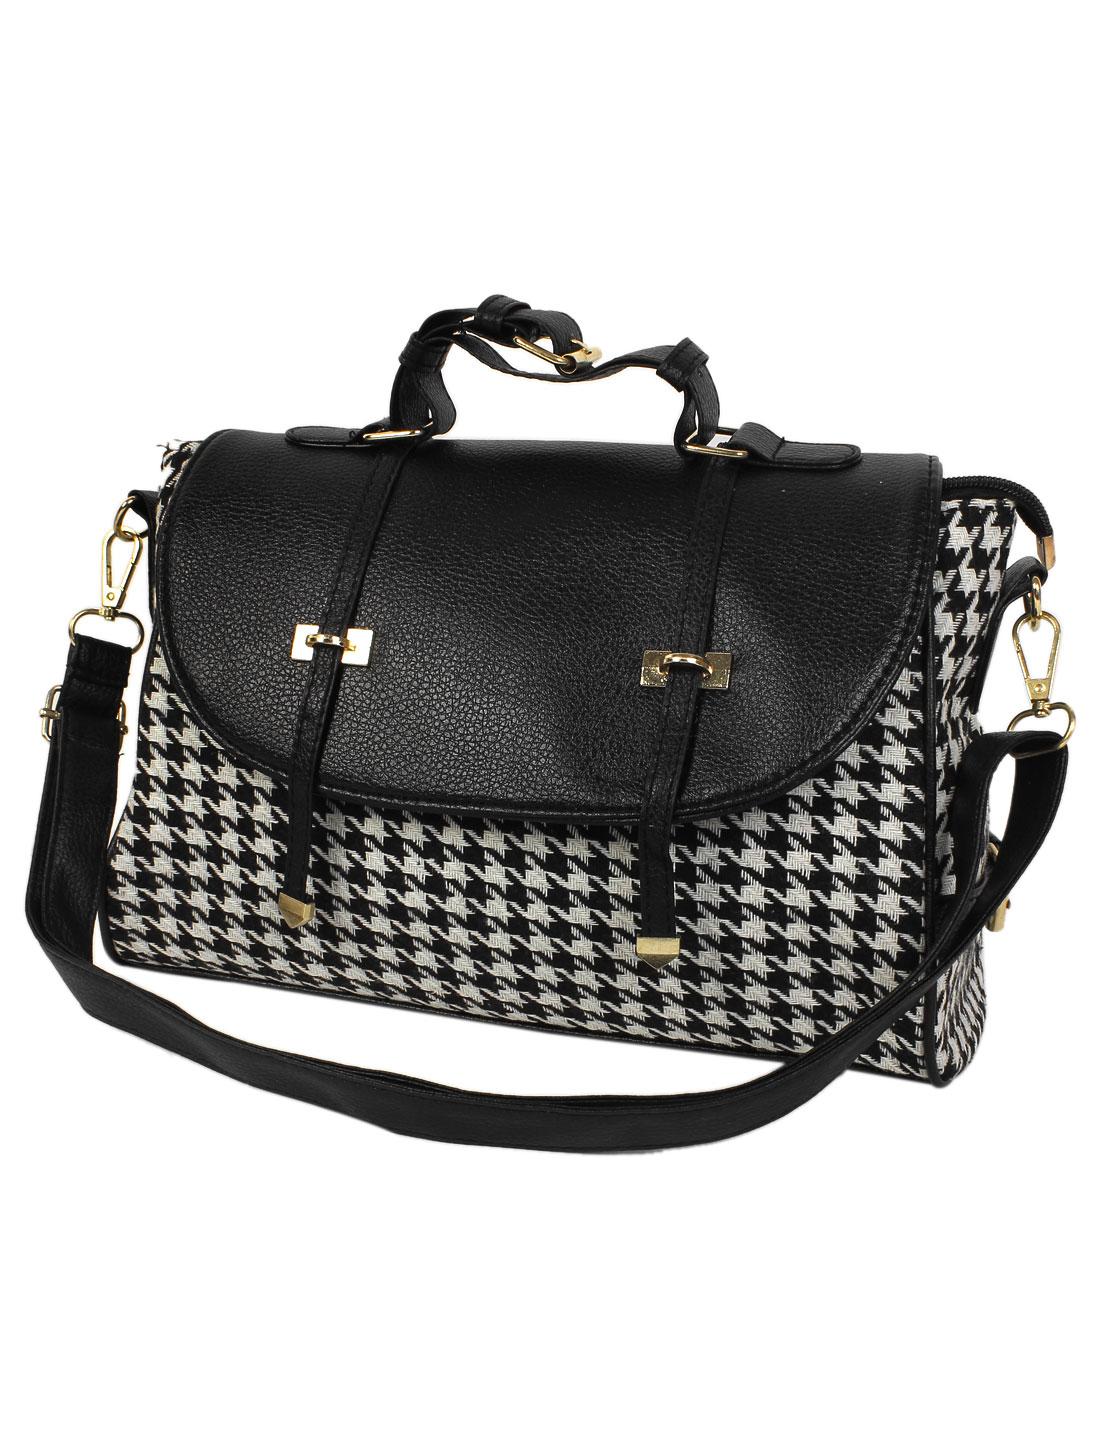 2015 Elegant New Women Houndstooth Double Arrow Handbag Shoulder Bag Tote